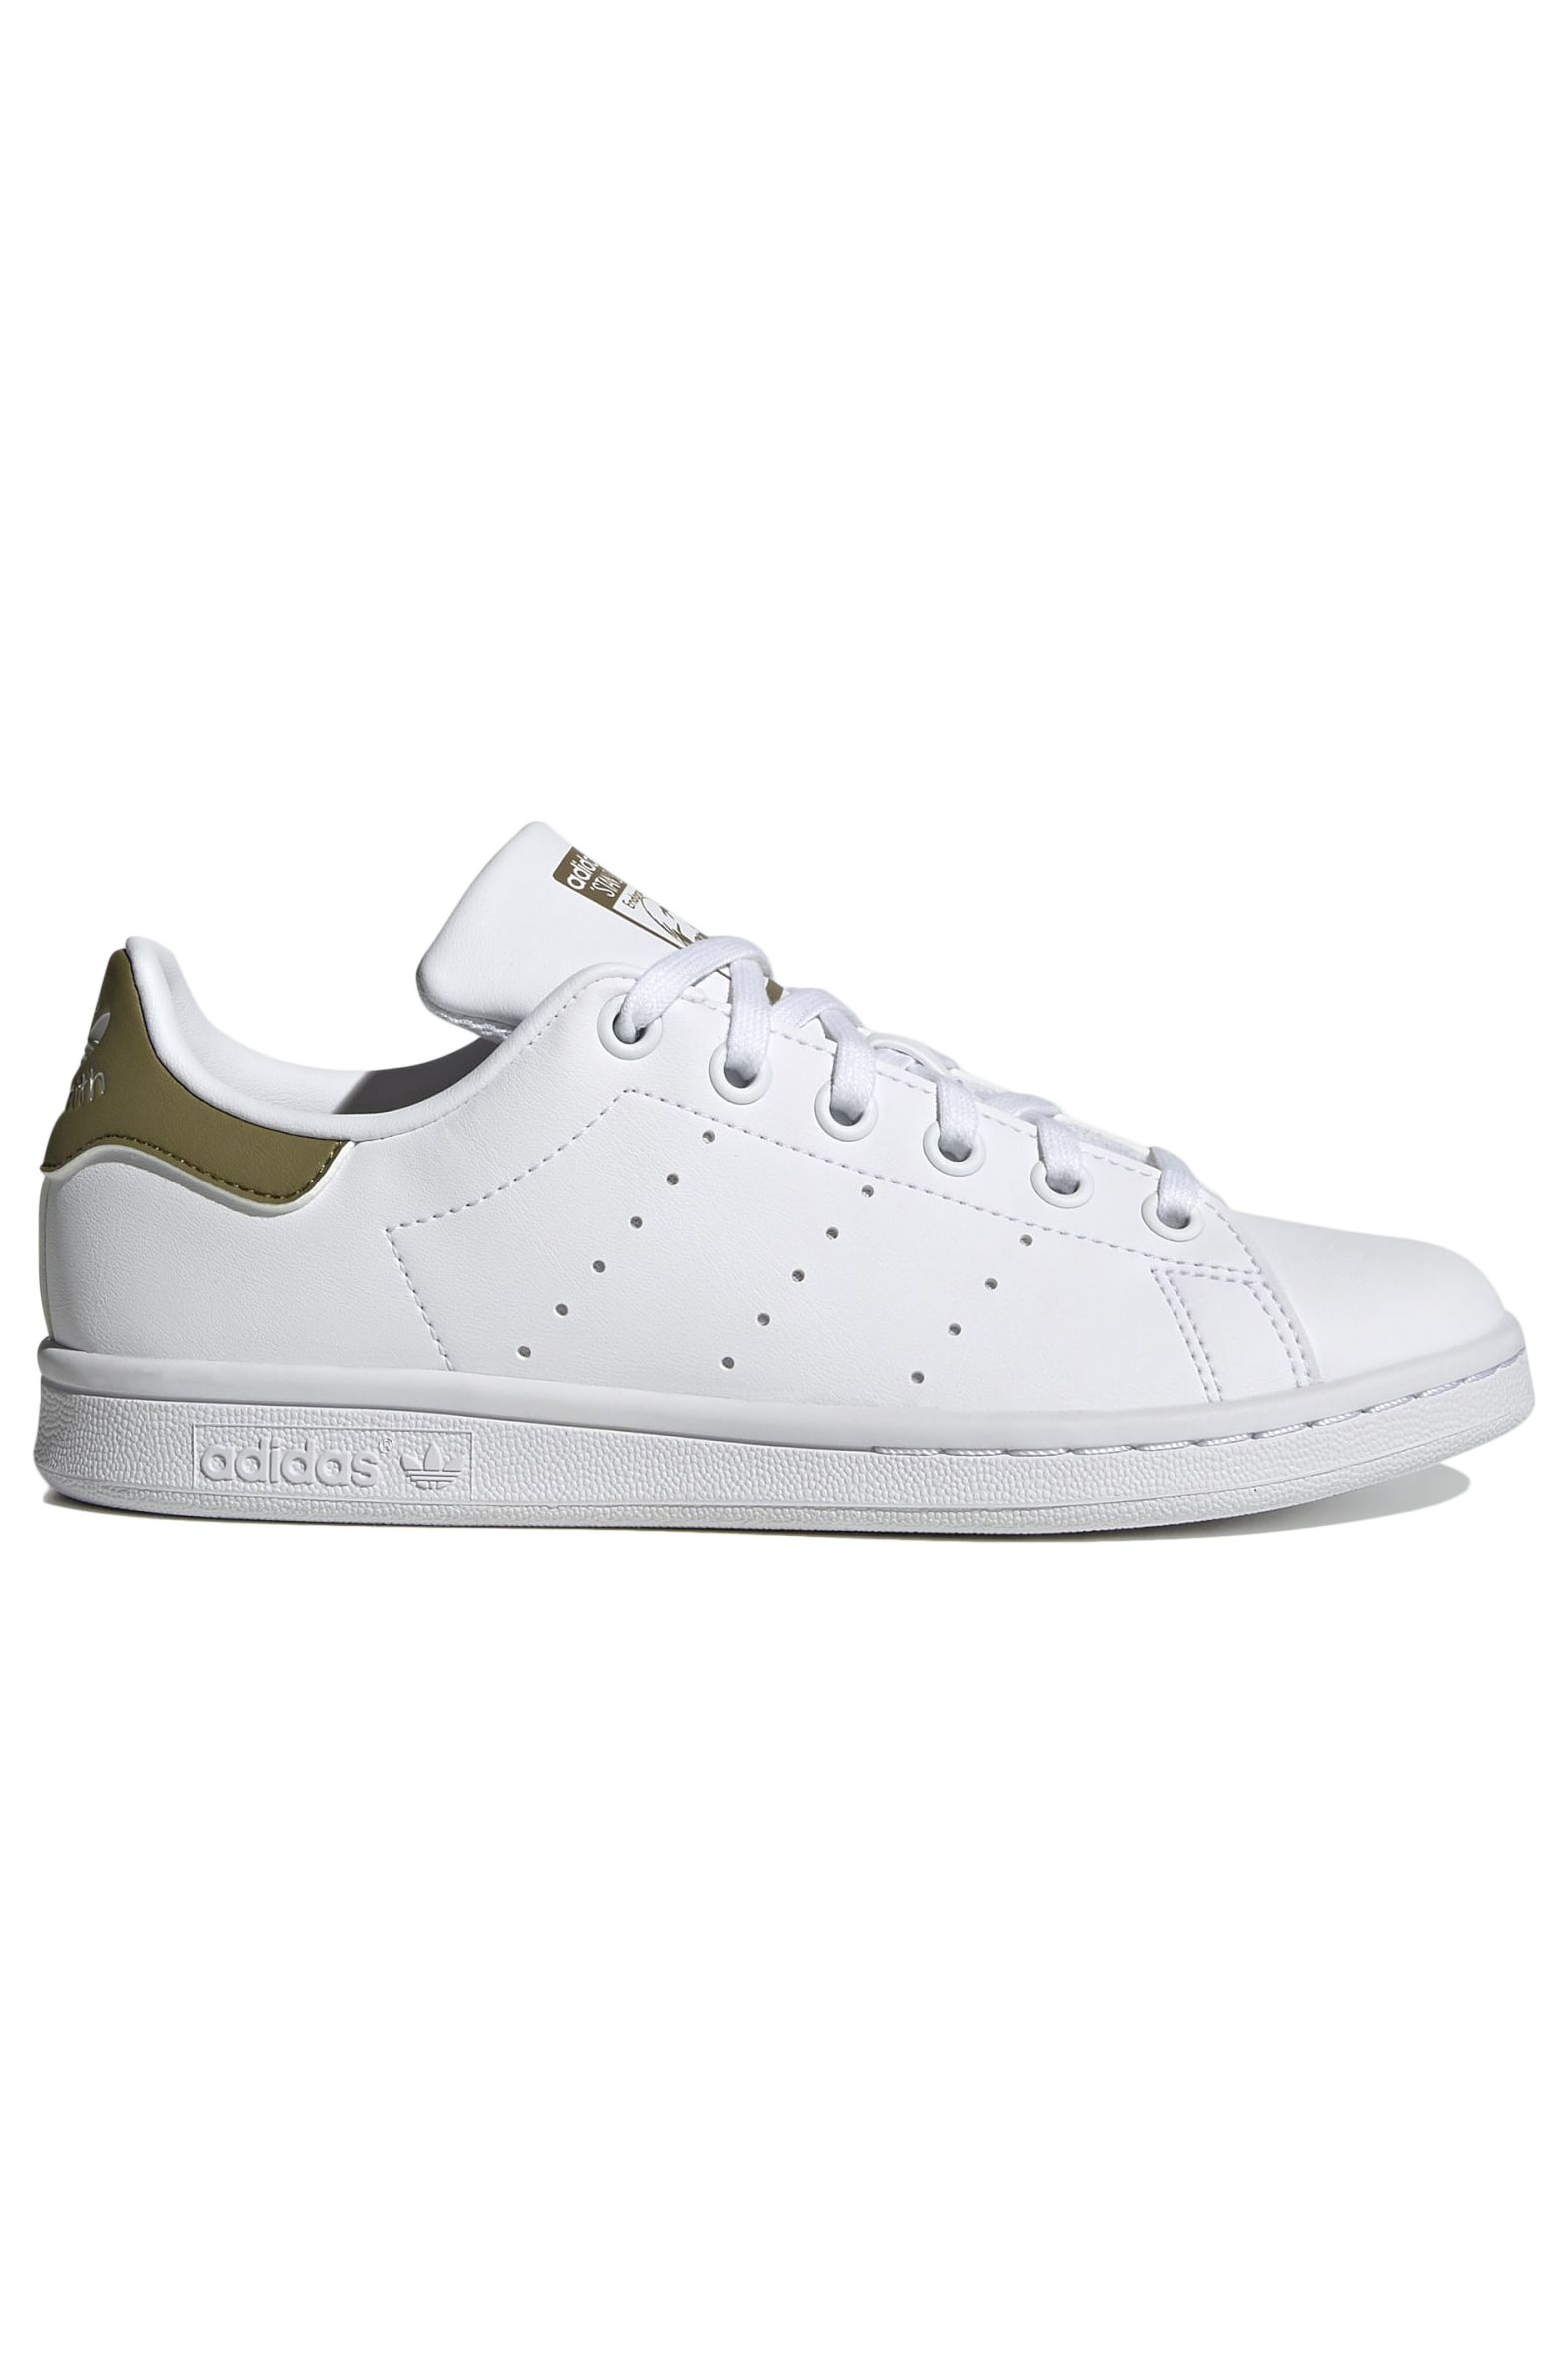 Adidas Shoes STAN SMITH J Ftwr White/Ftwr White/Wild Moss